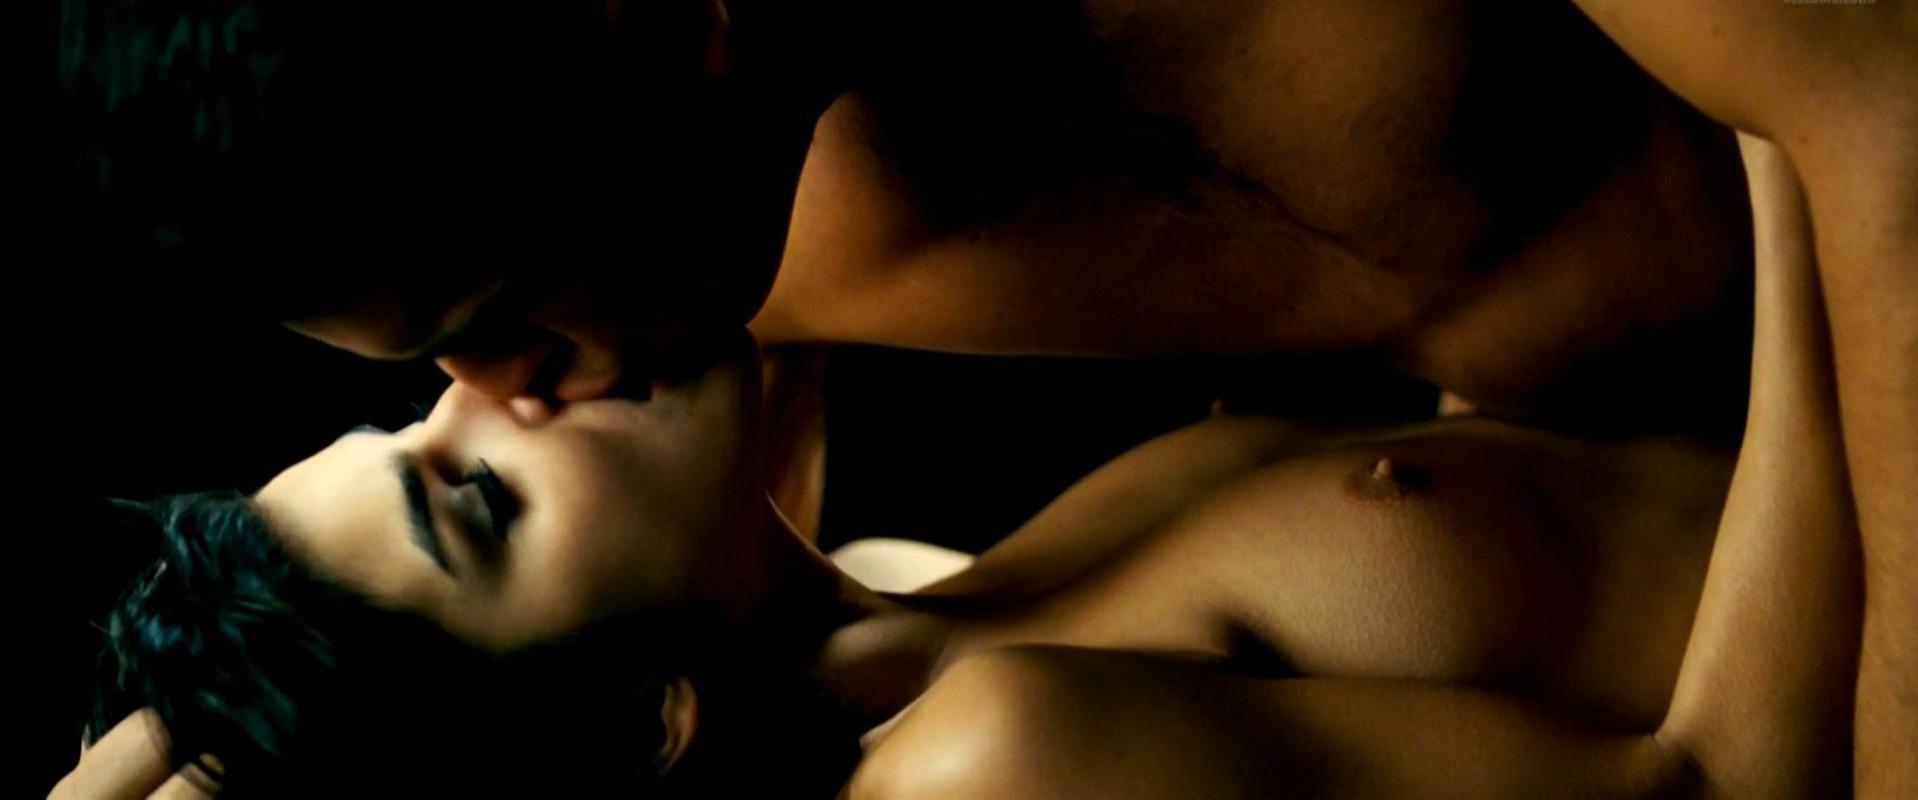 Salma hayek nude hot sex